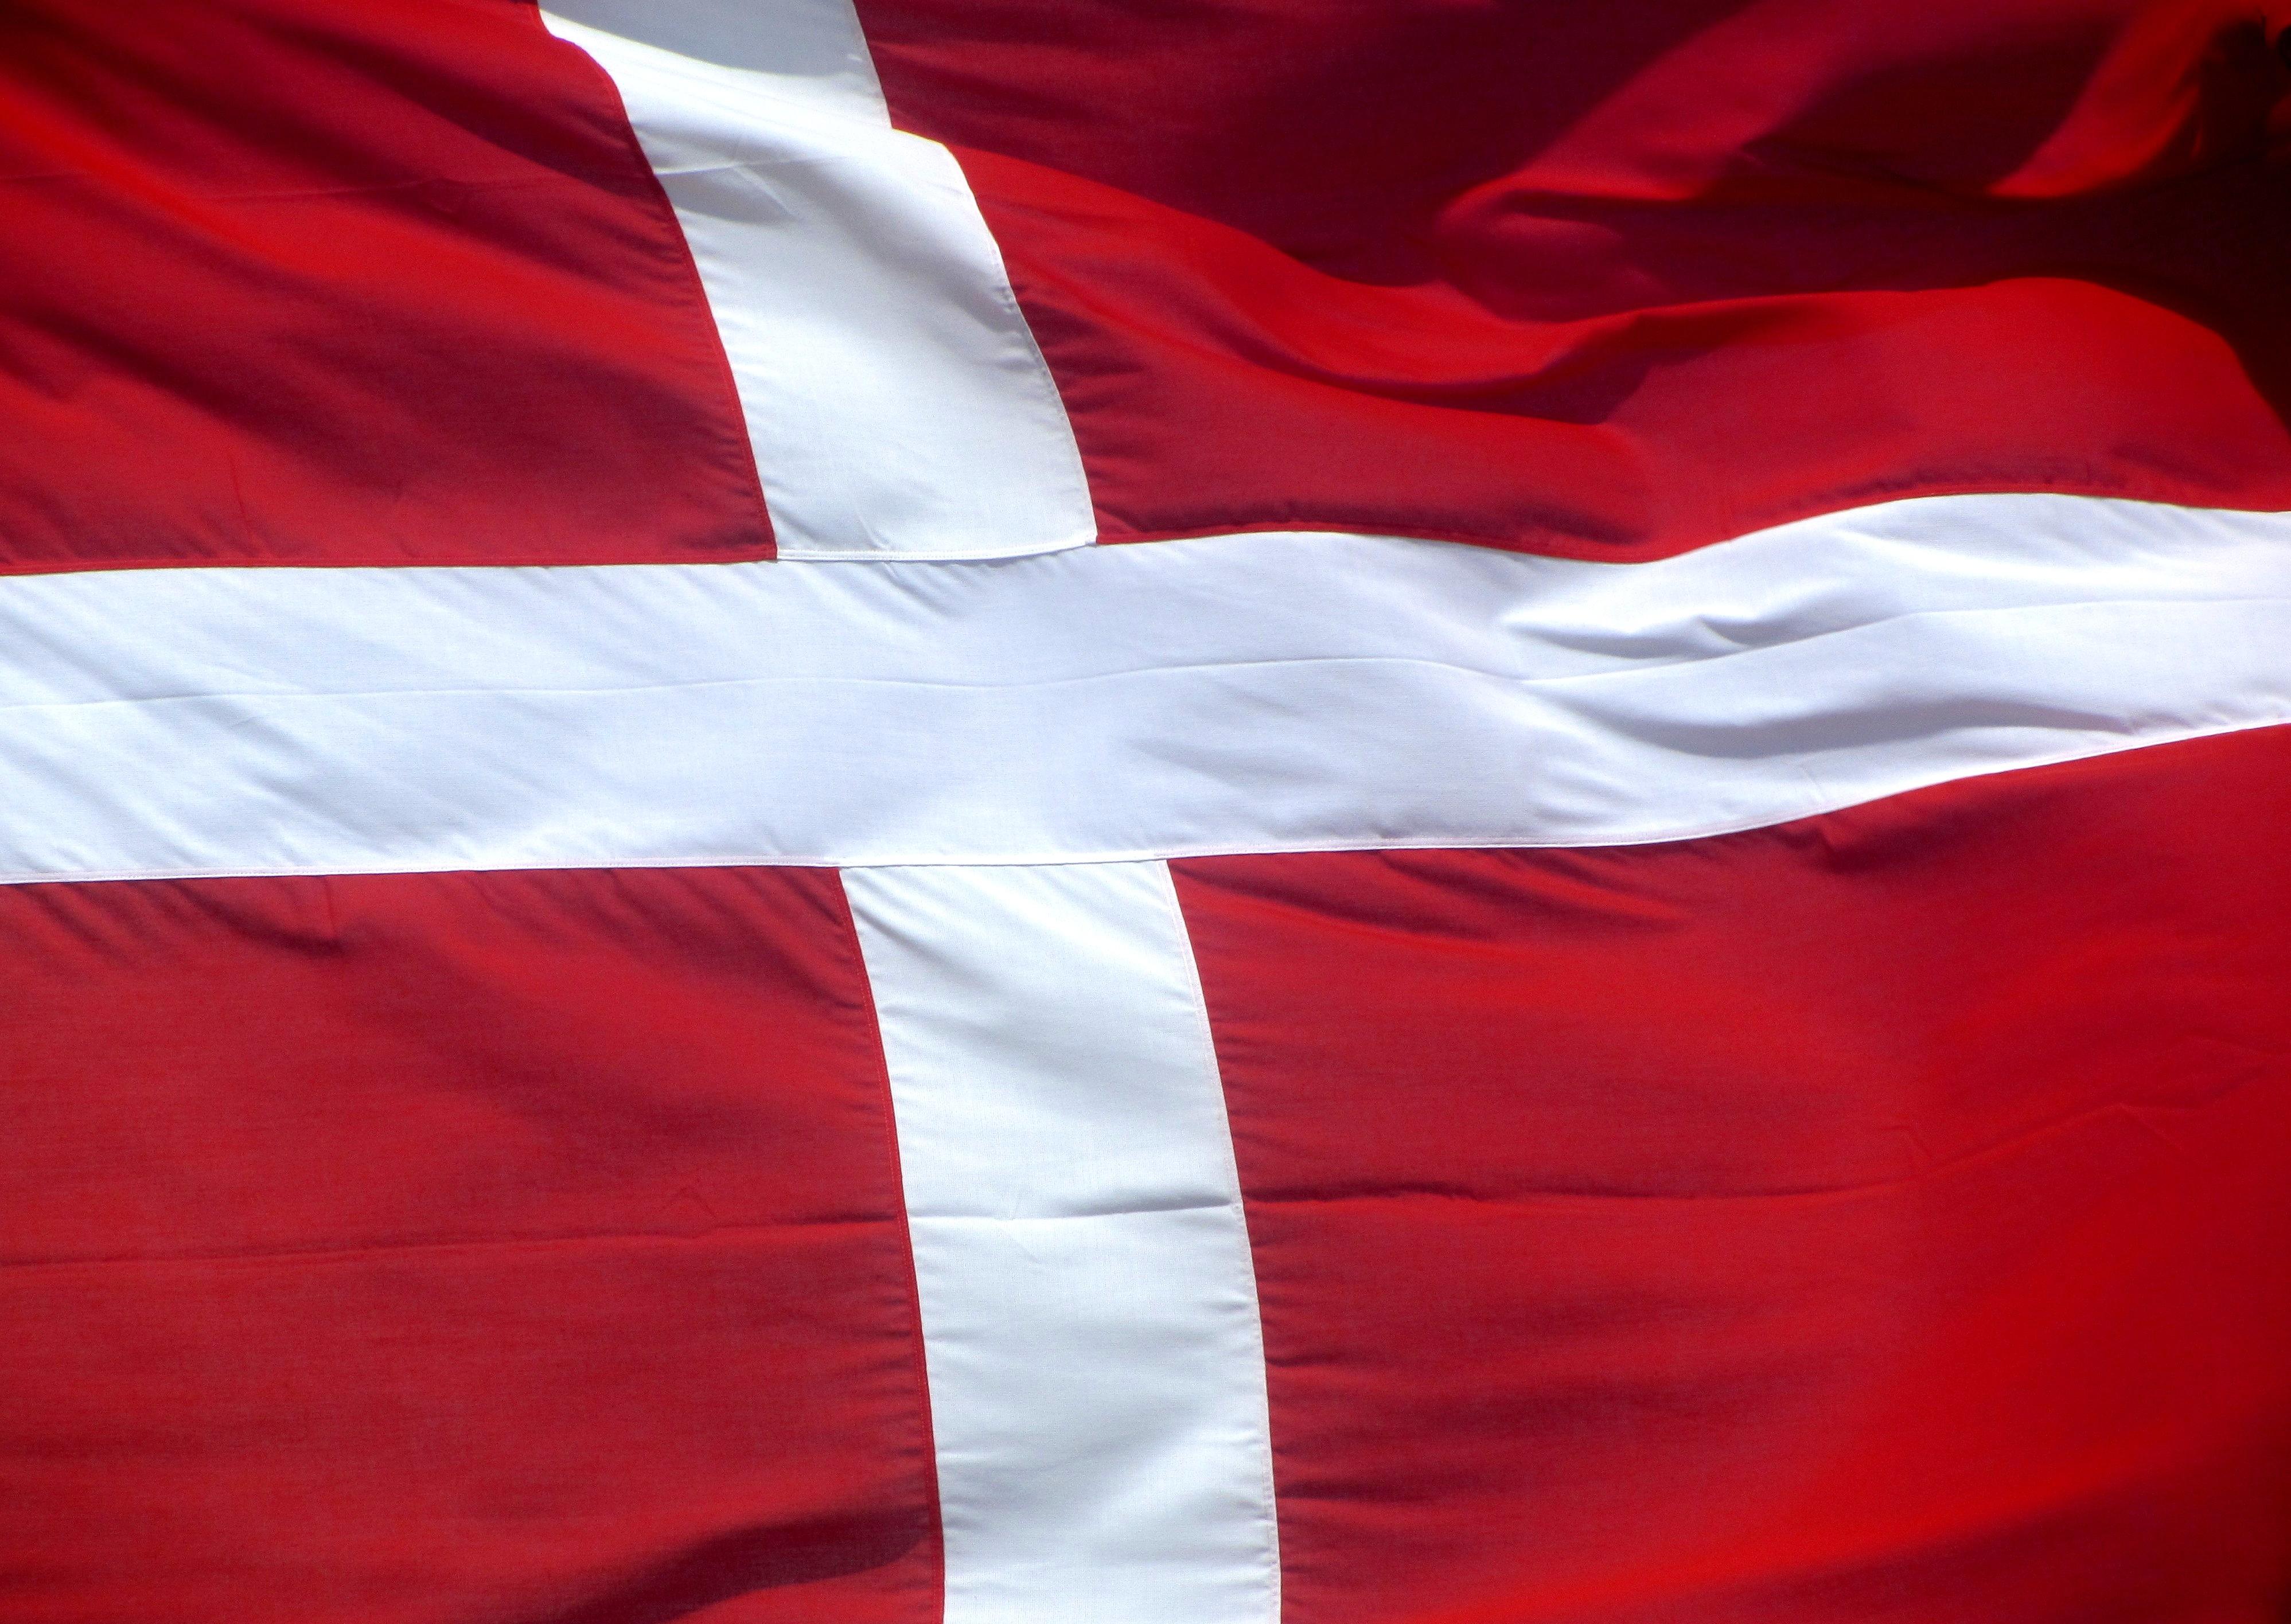 Dánska vlajka